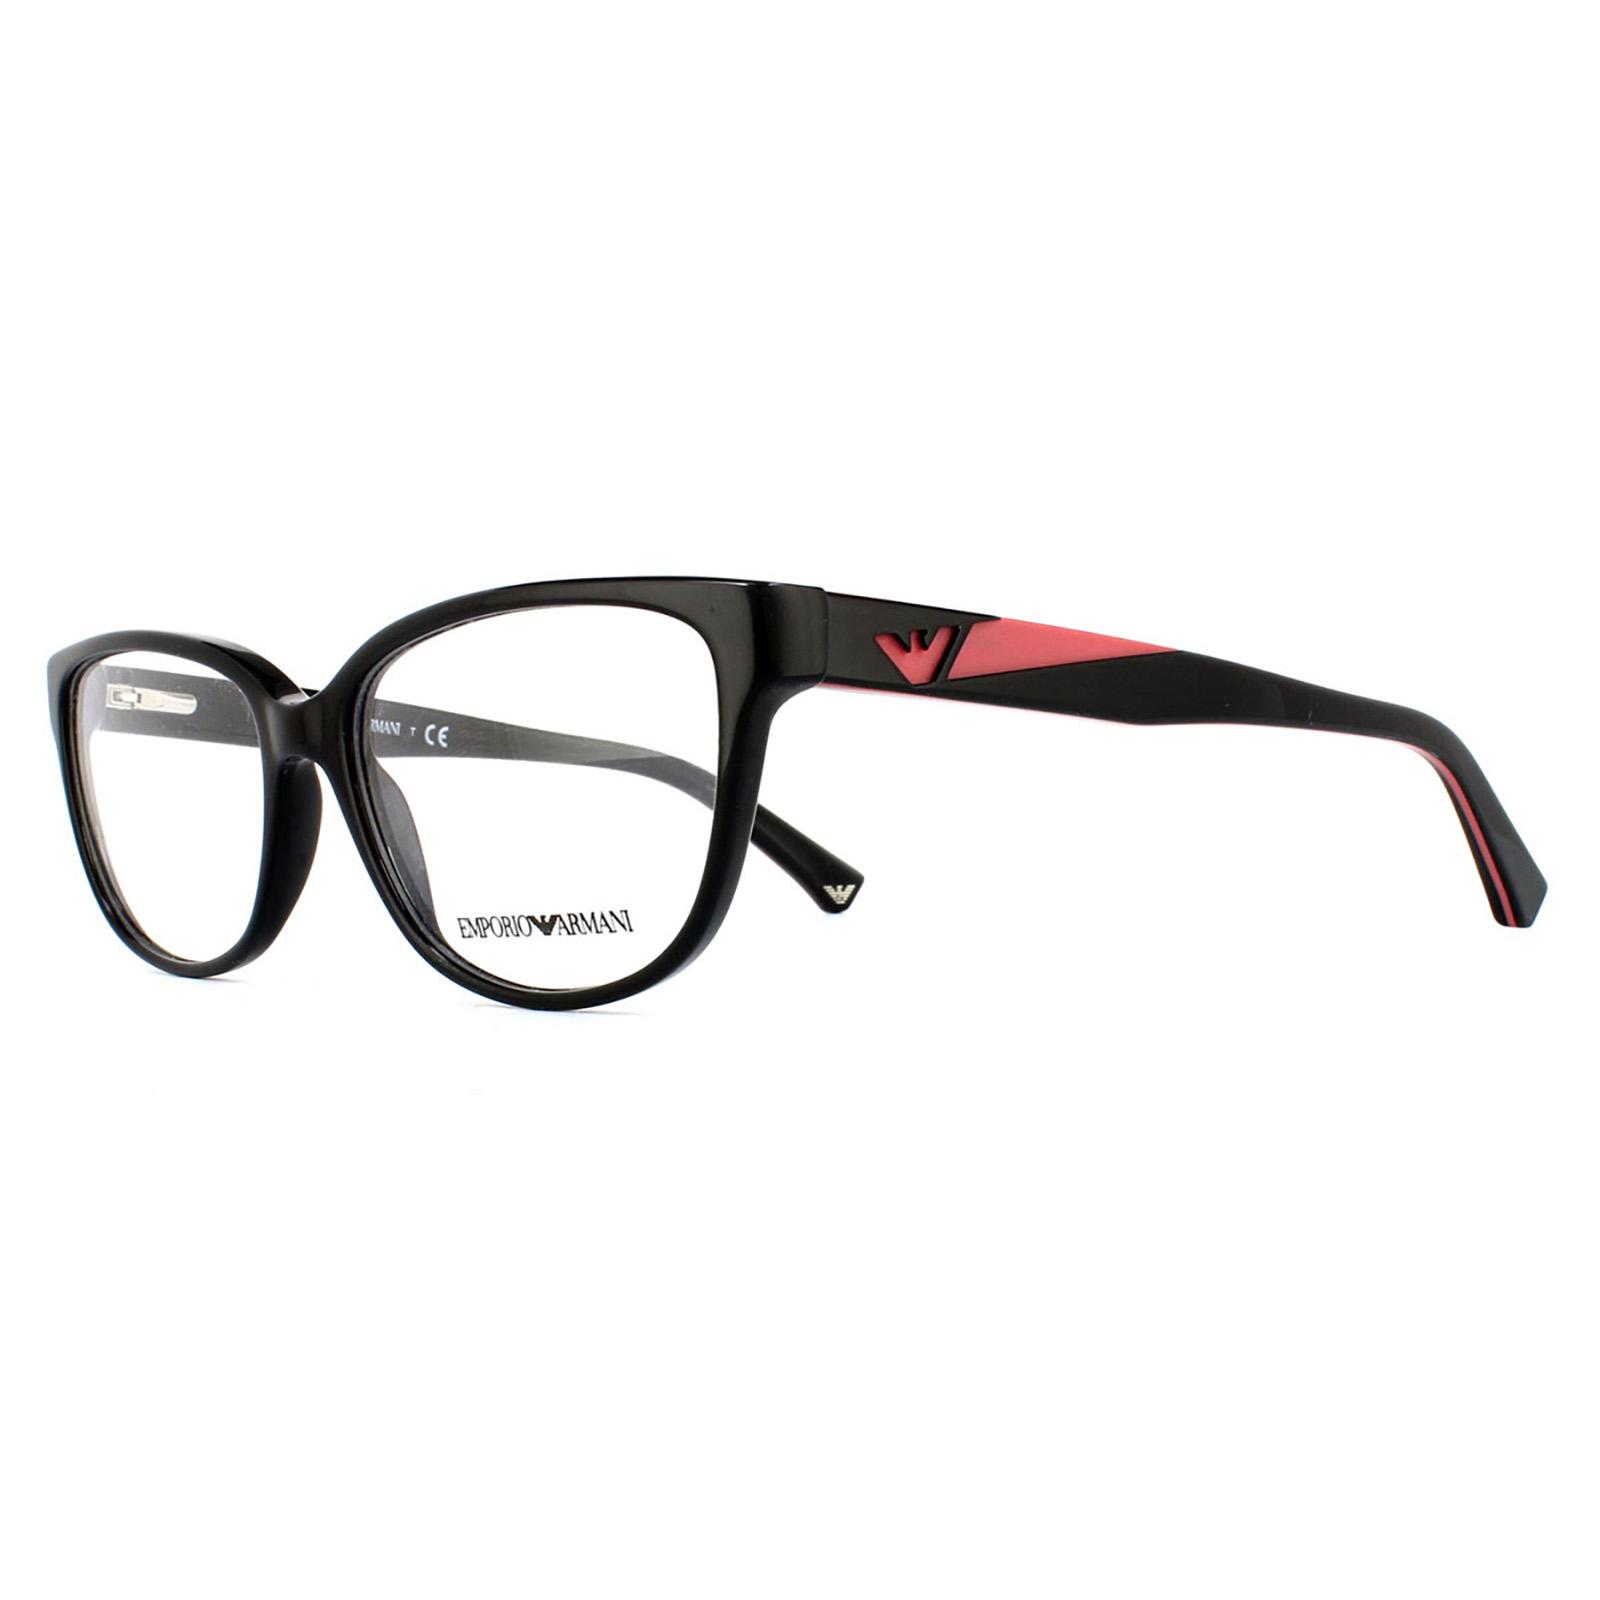 cheap emporio armani 3081 glasses frames discounted